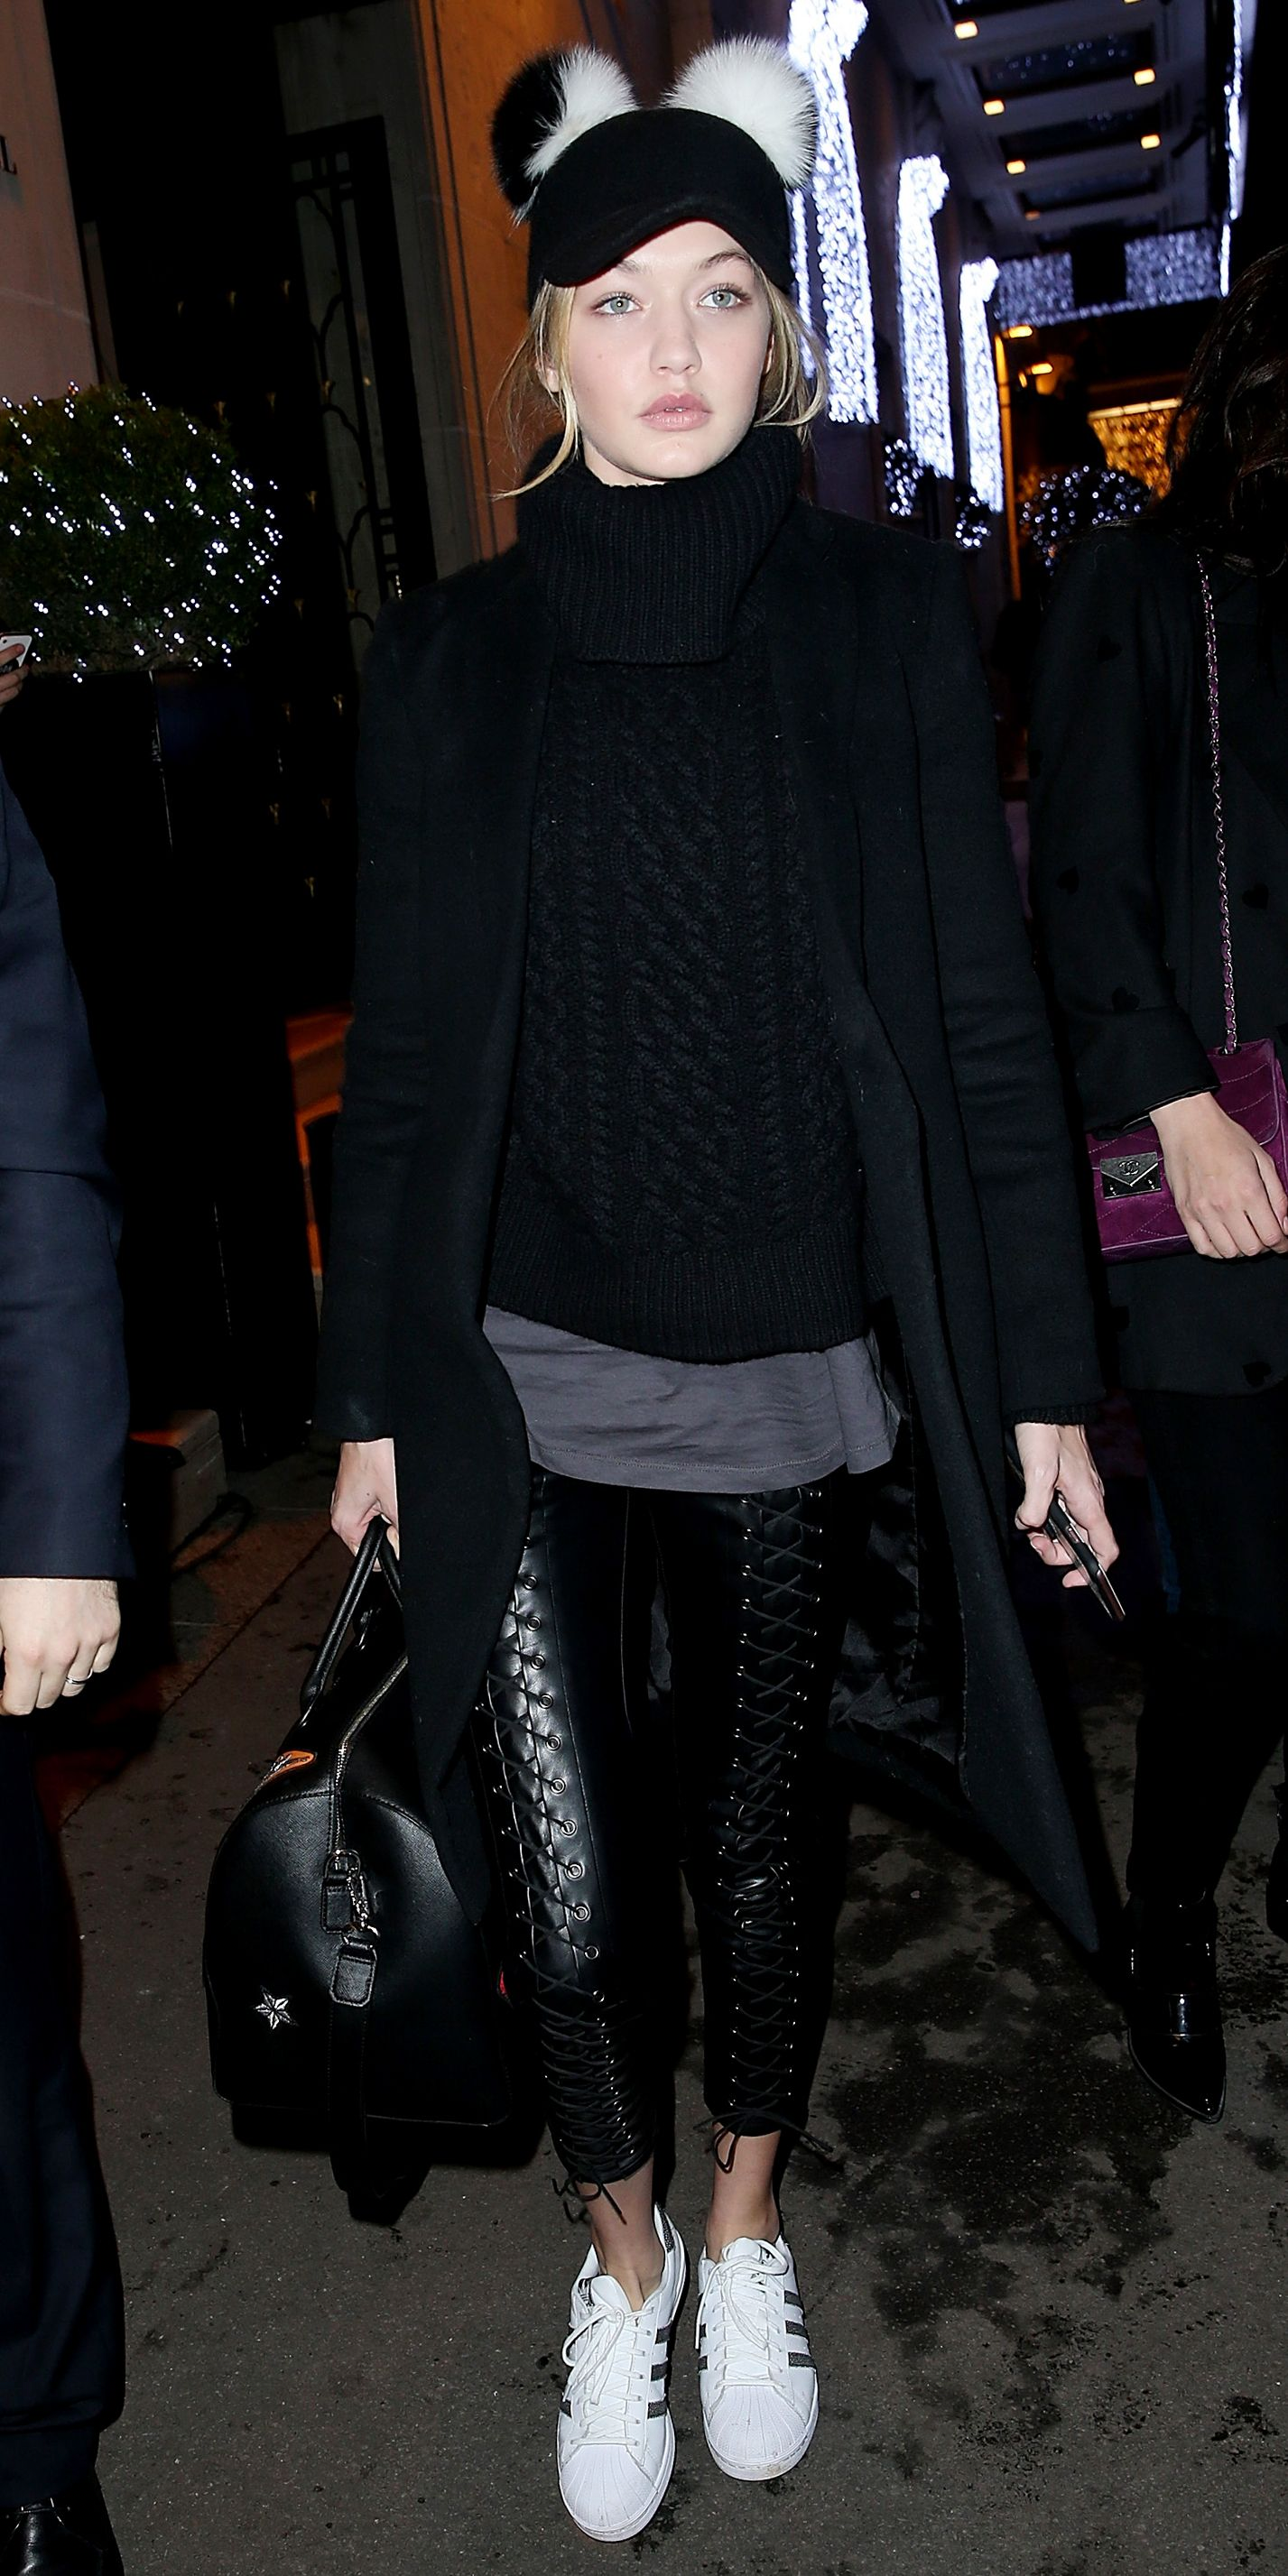 promo code f8aa0 ddaae How to Wear Adidas Superstars Like Kylie Jenner and Gigi Hadid - Gigi Hadid  from InStyle.com